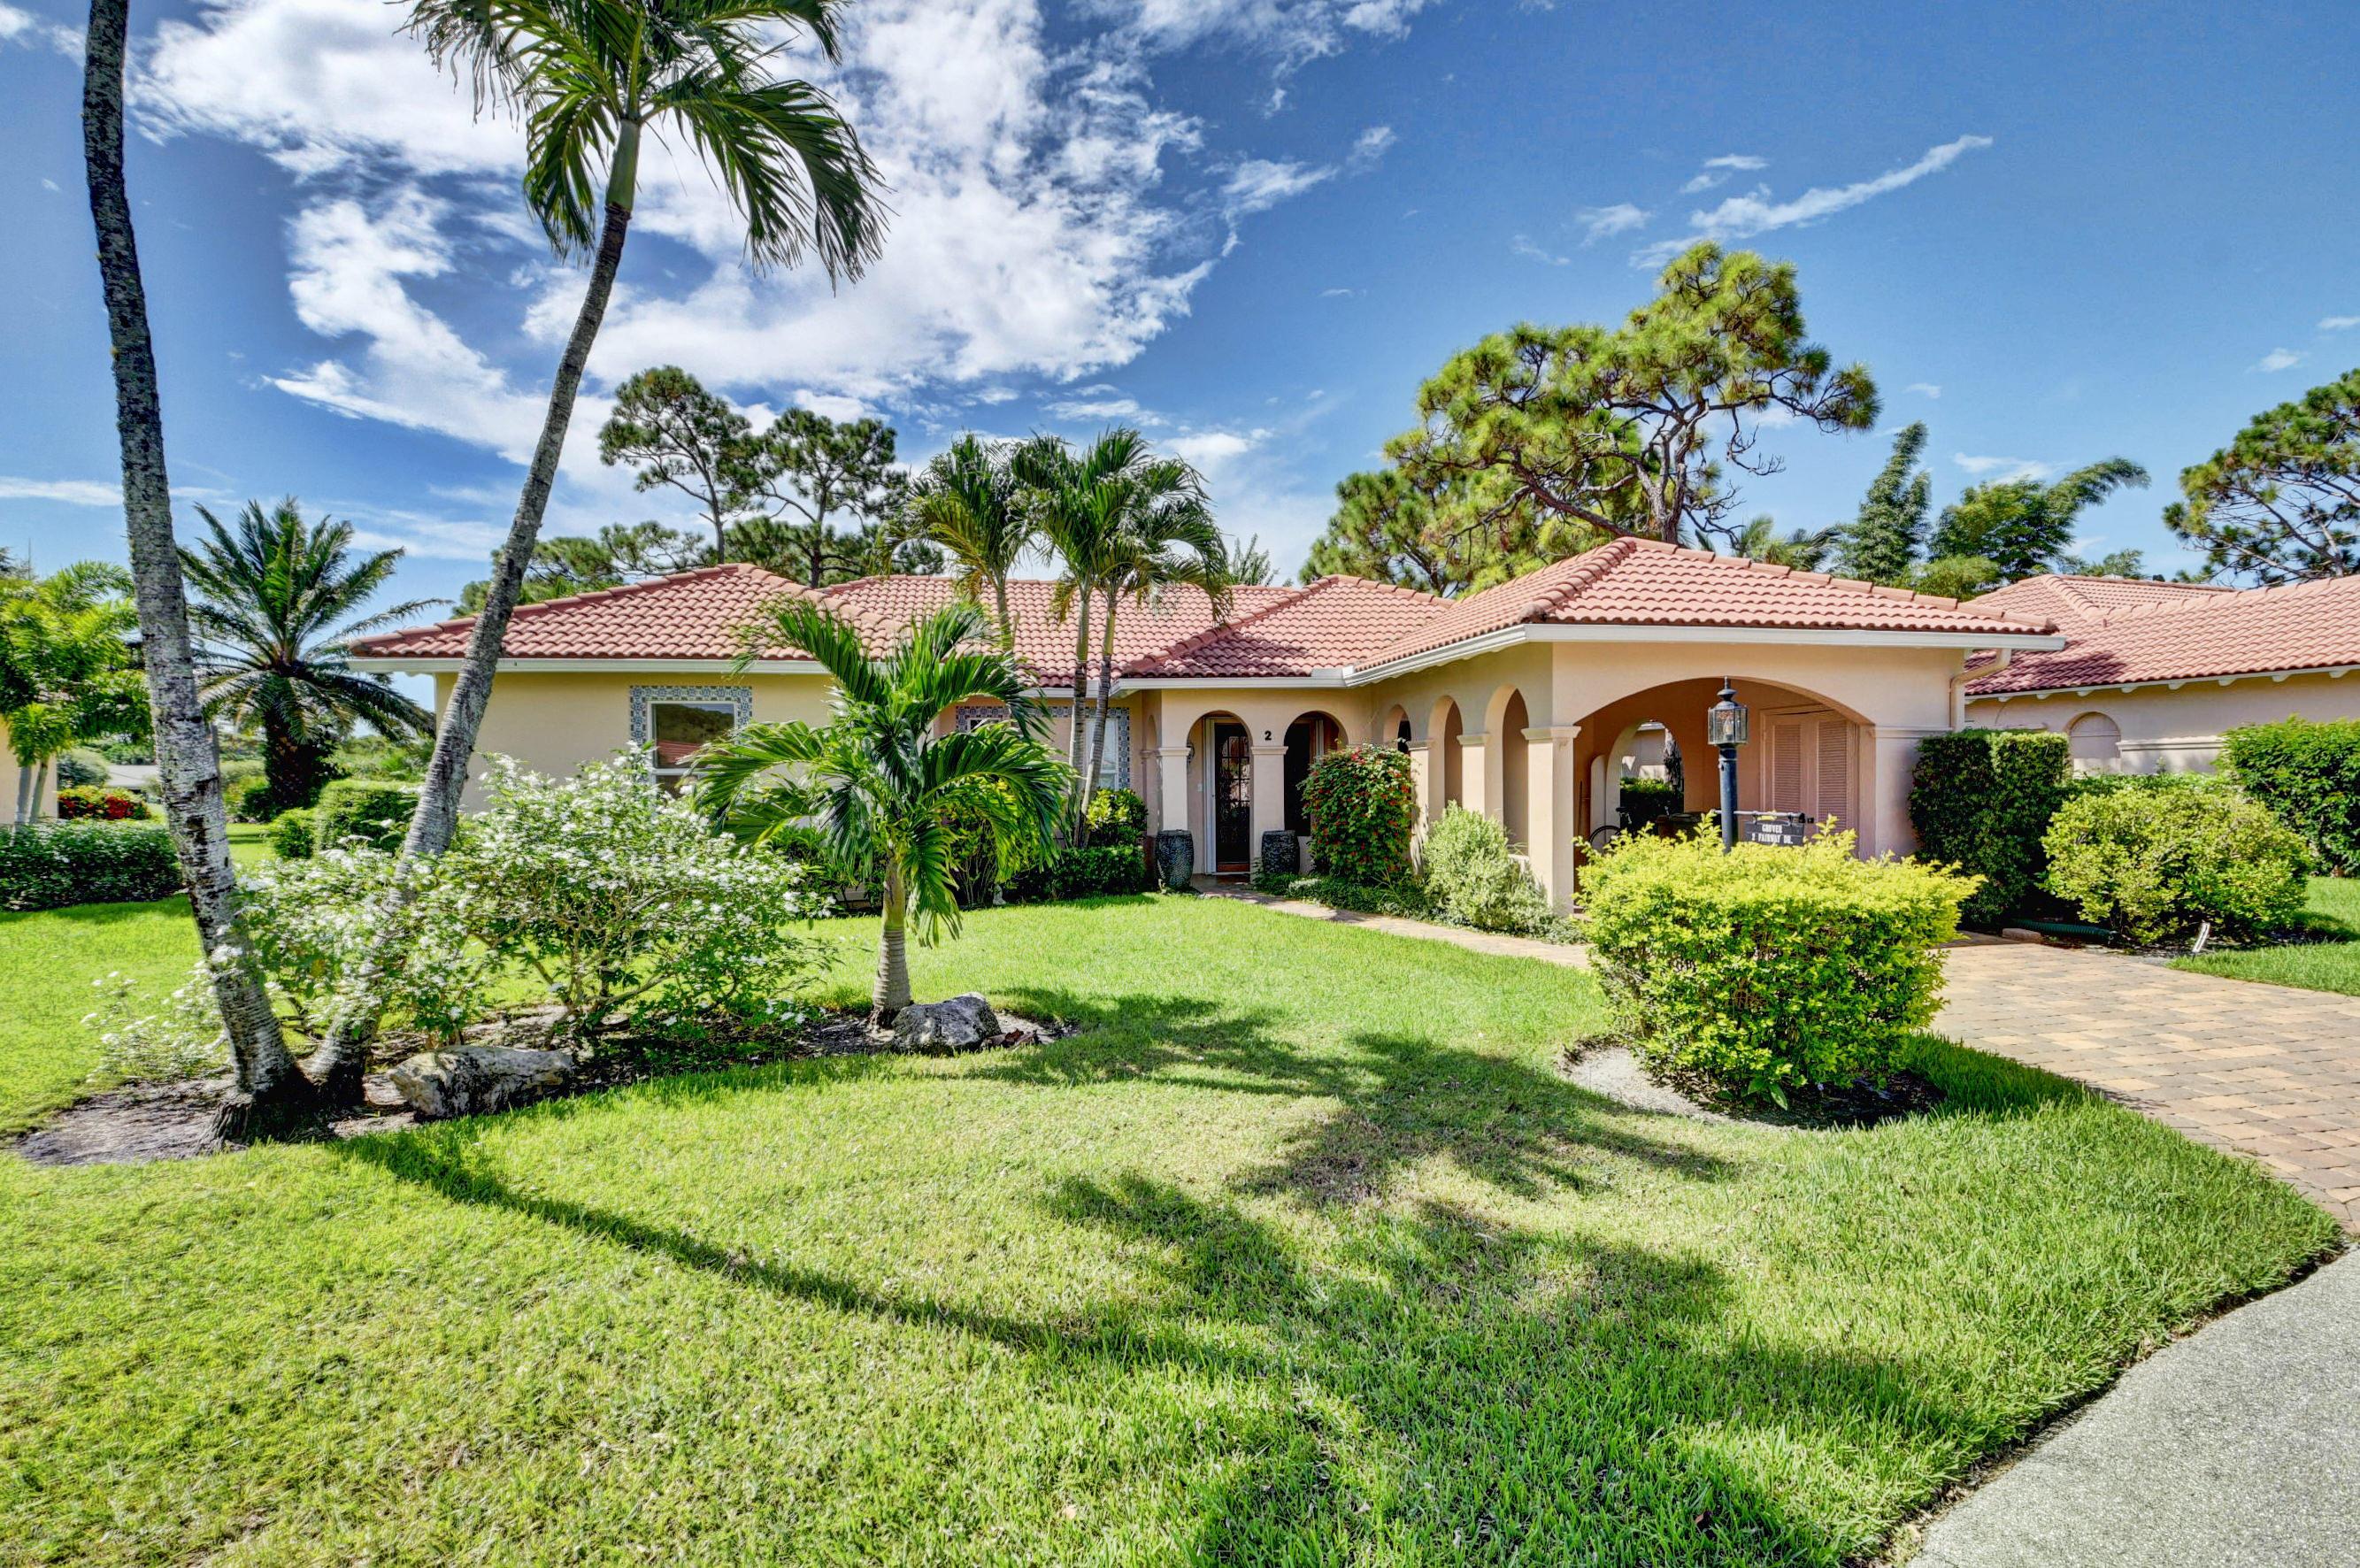 Details for 2 Fairway Villas, Boynton Beach, FL 33436